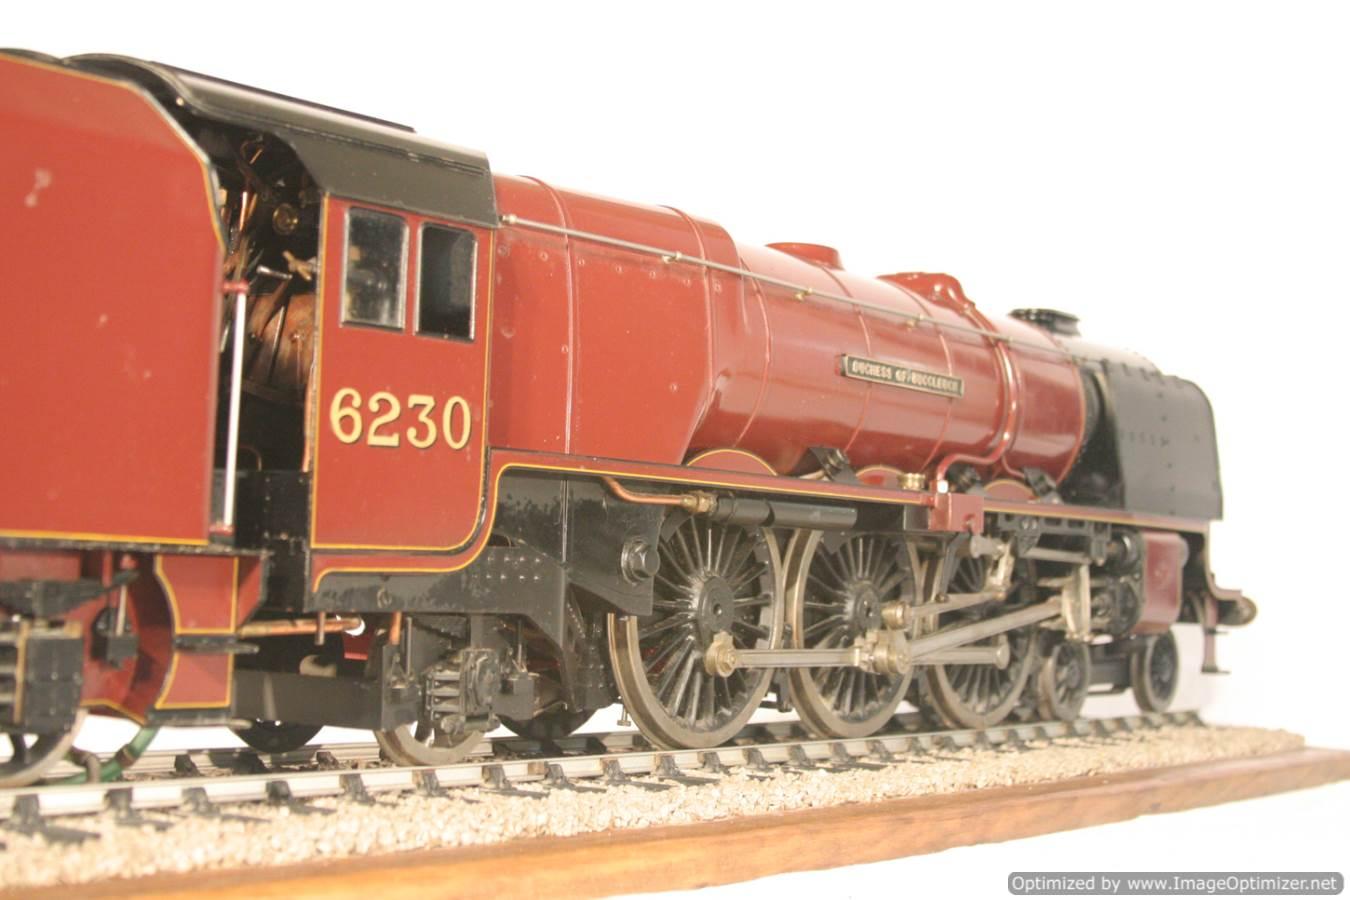 test 3 gauge LMS Stanier Duchess locomotive live steam model for sale 08-Optimized